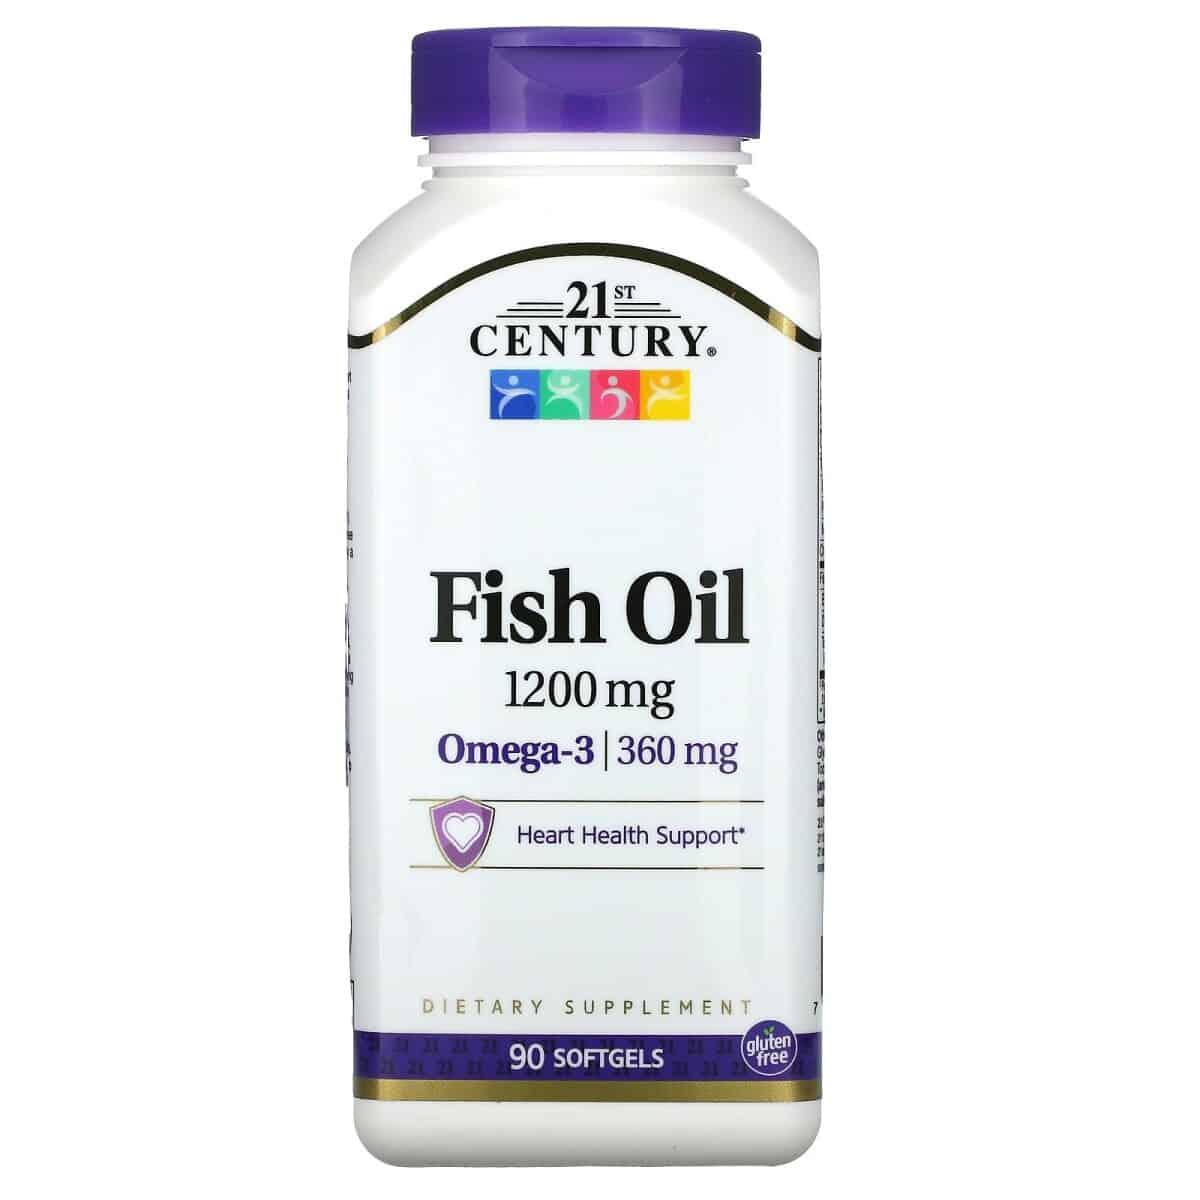 Foto 1 - Fish Oil Omega-3 1200mg (90 capsulas) - 21st Century